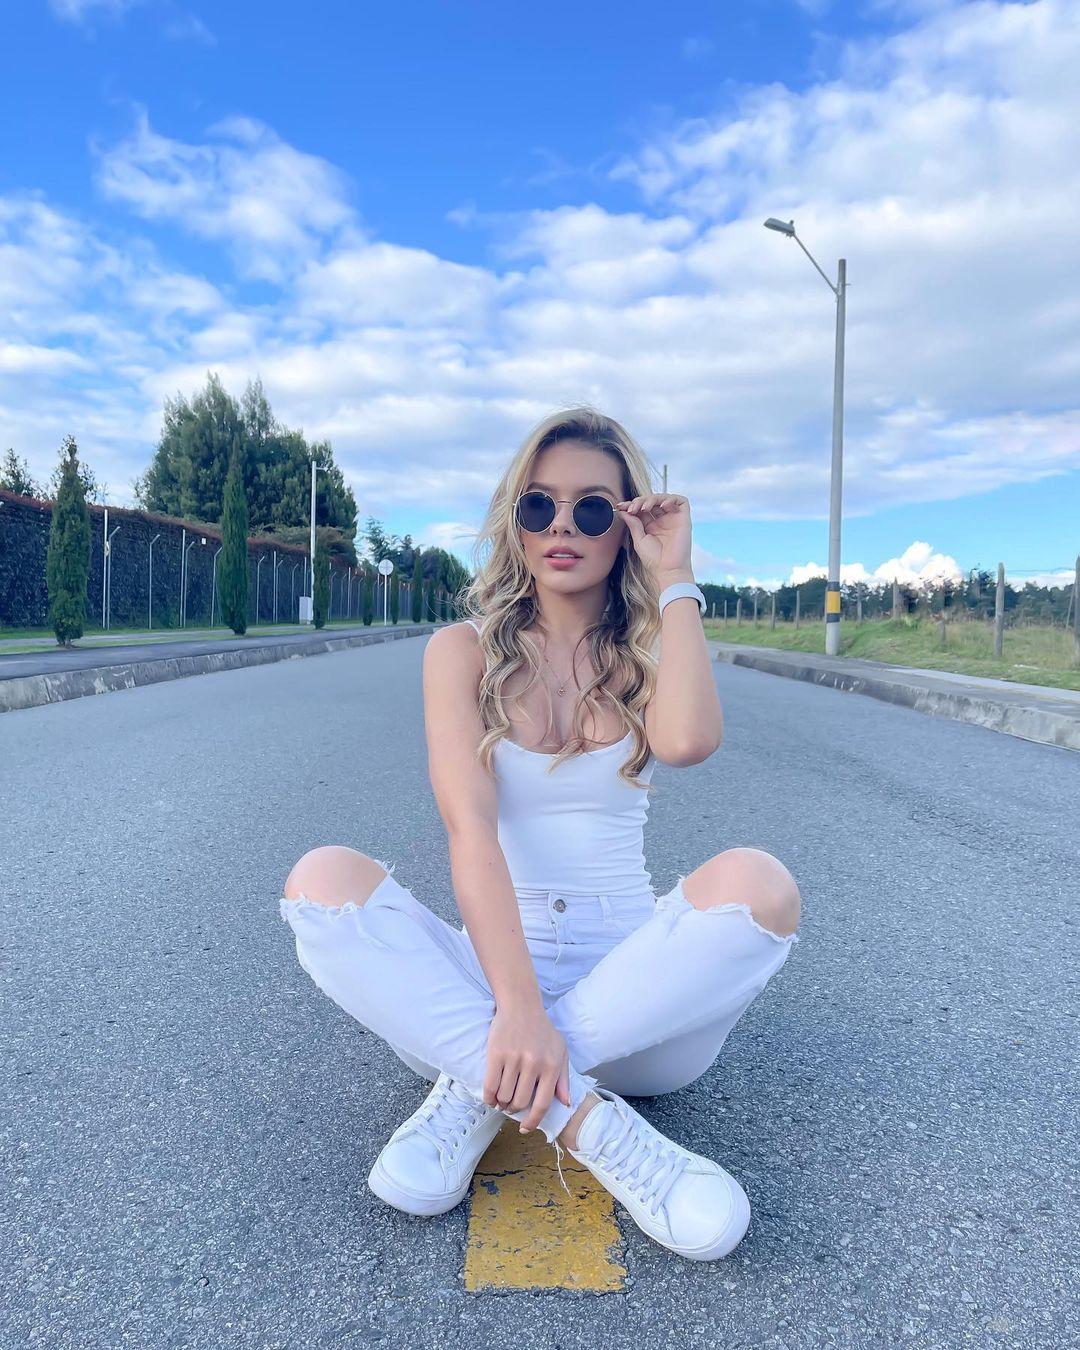 Luisa-Duque-Wallpapers-Insta-Fit-Bio-10